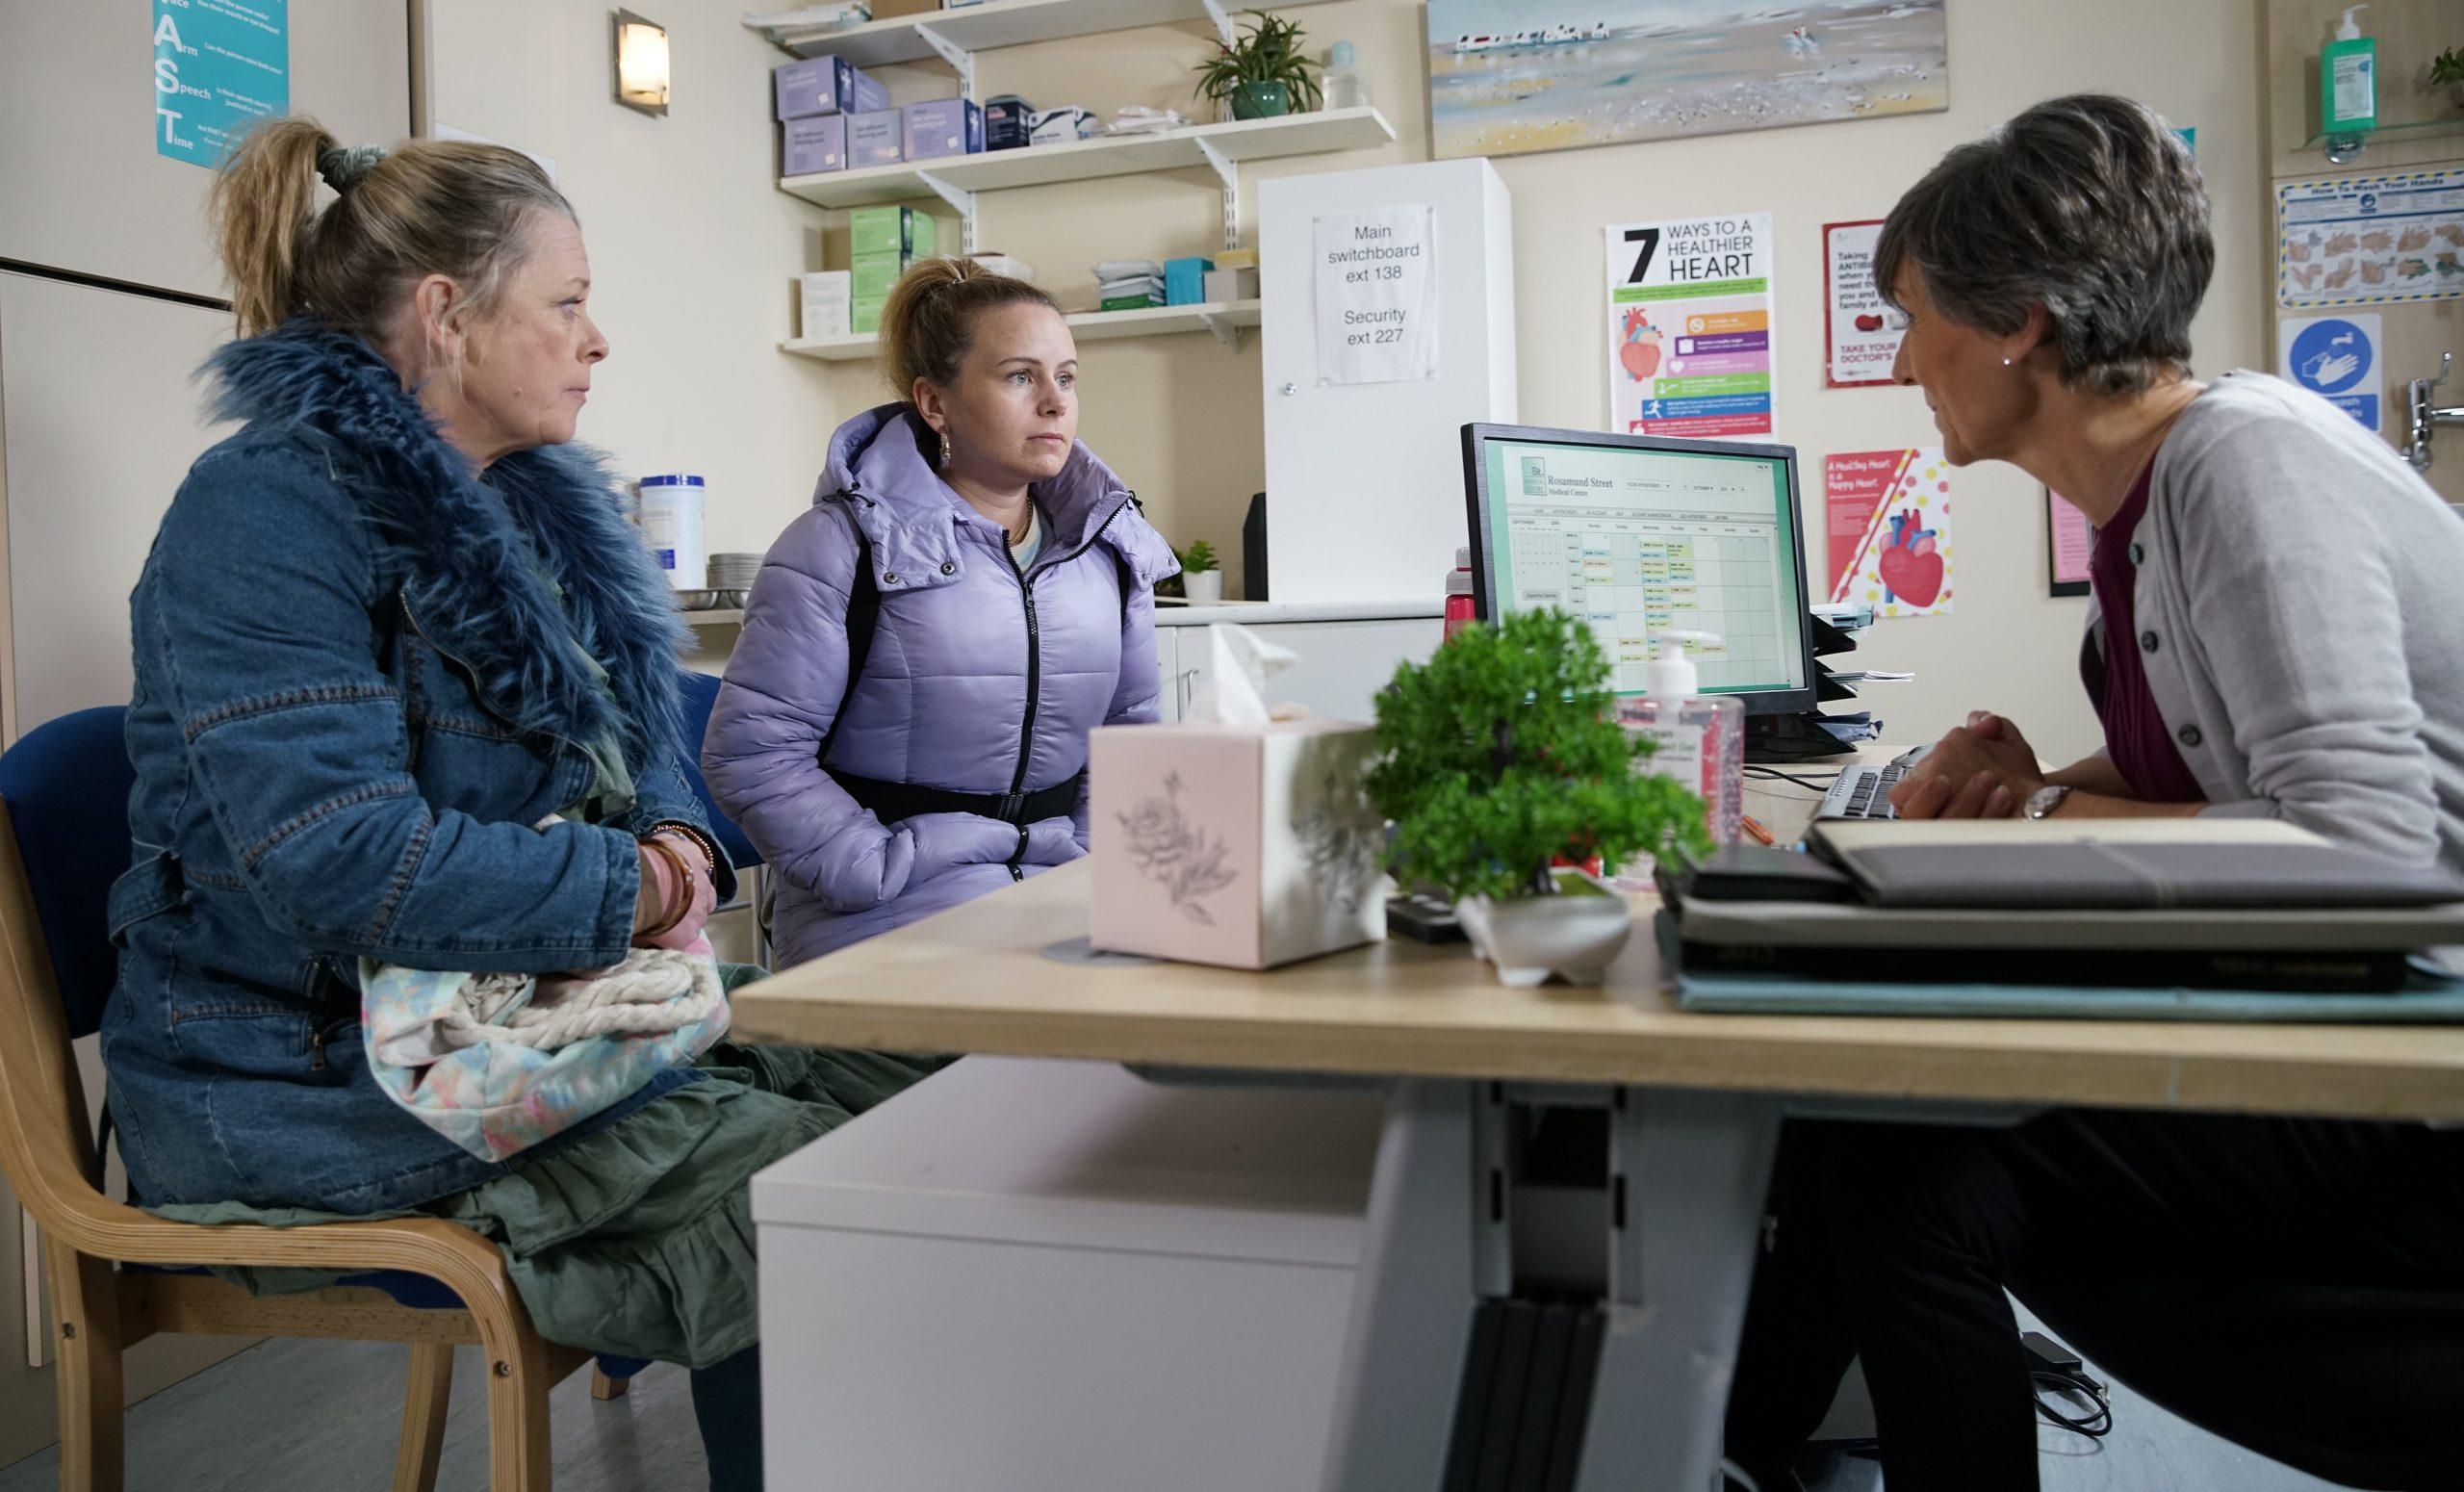 Coronation Street viewers divided over Gemma Winter's postnatal depression storyline